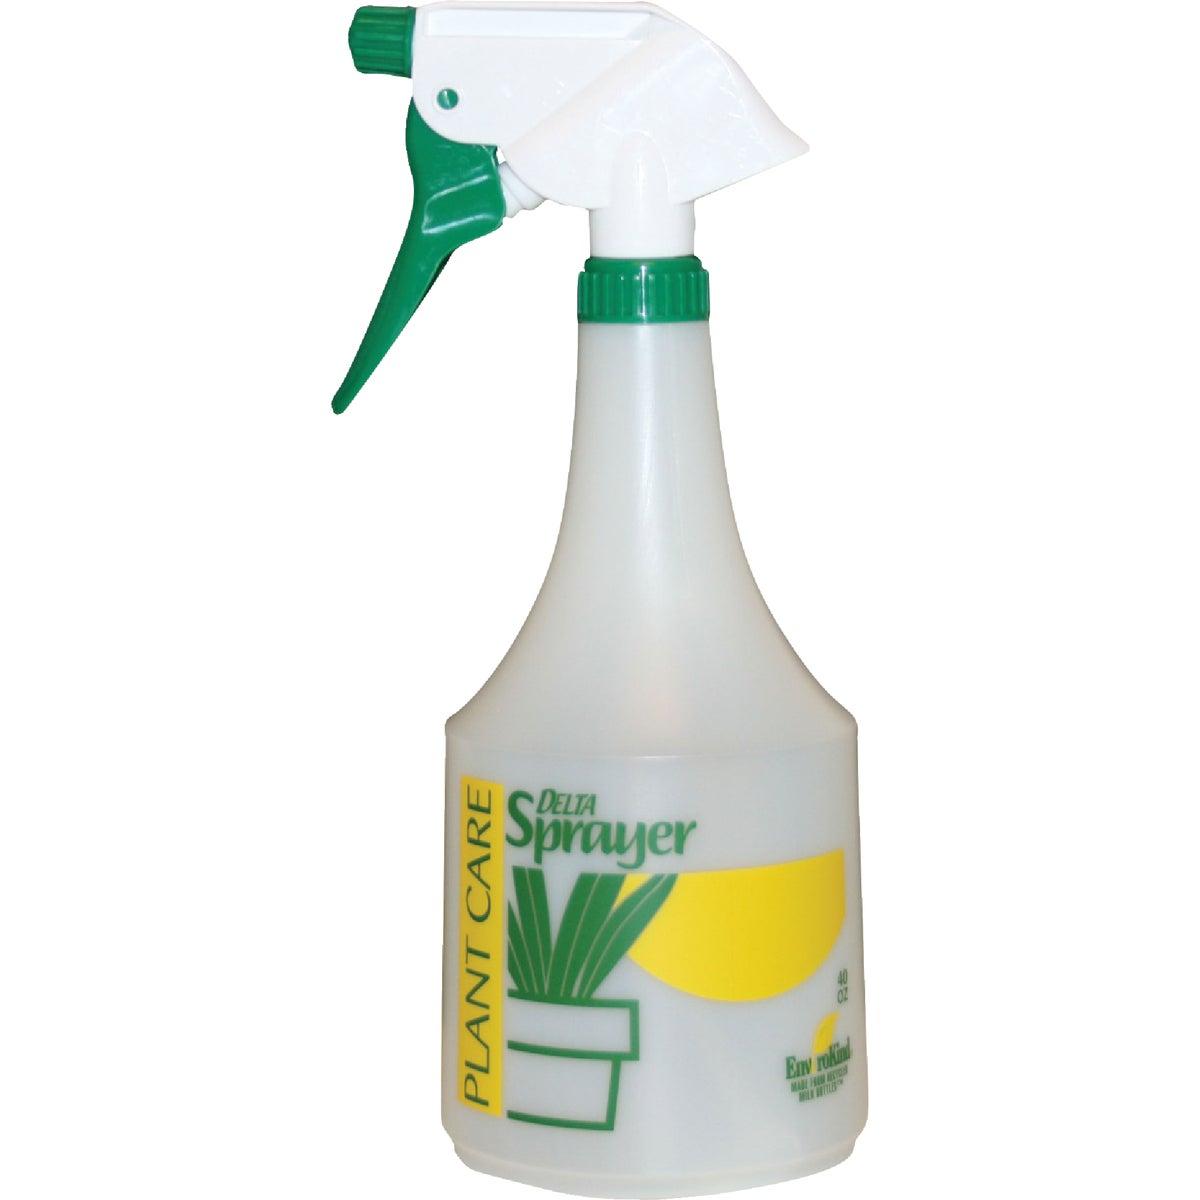 Prof Spray Bottle